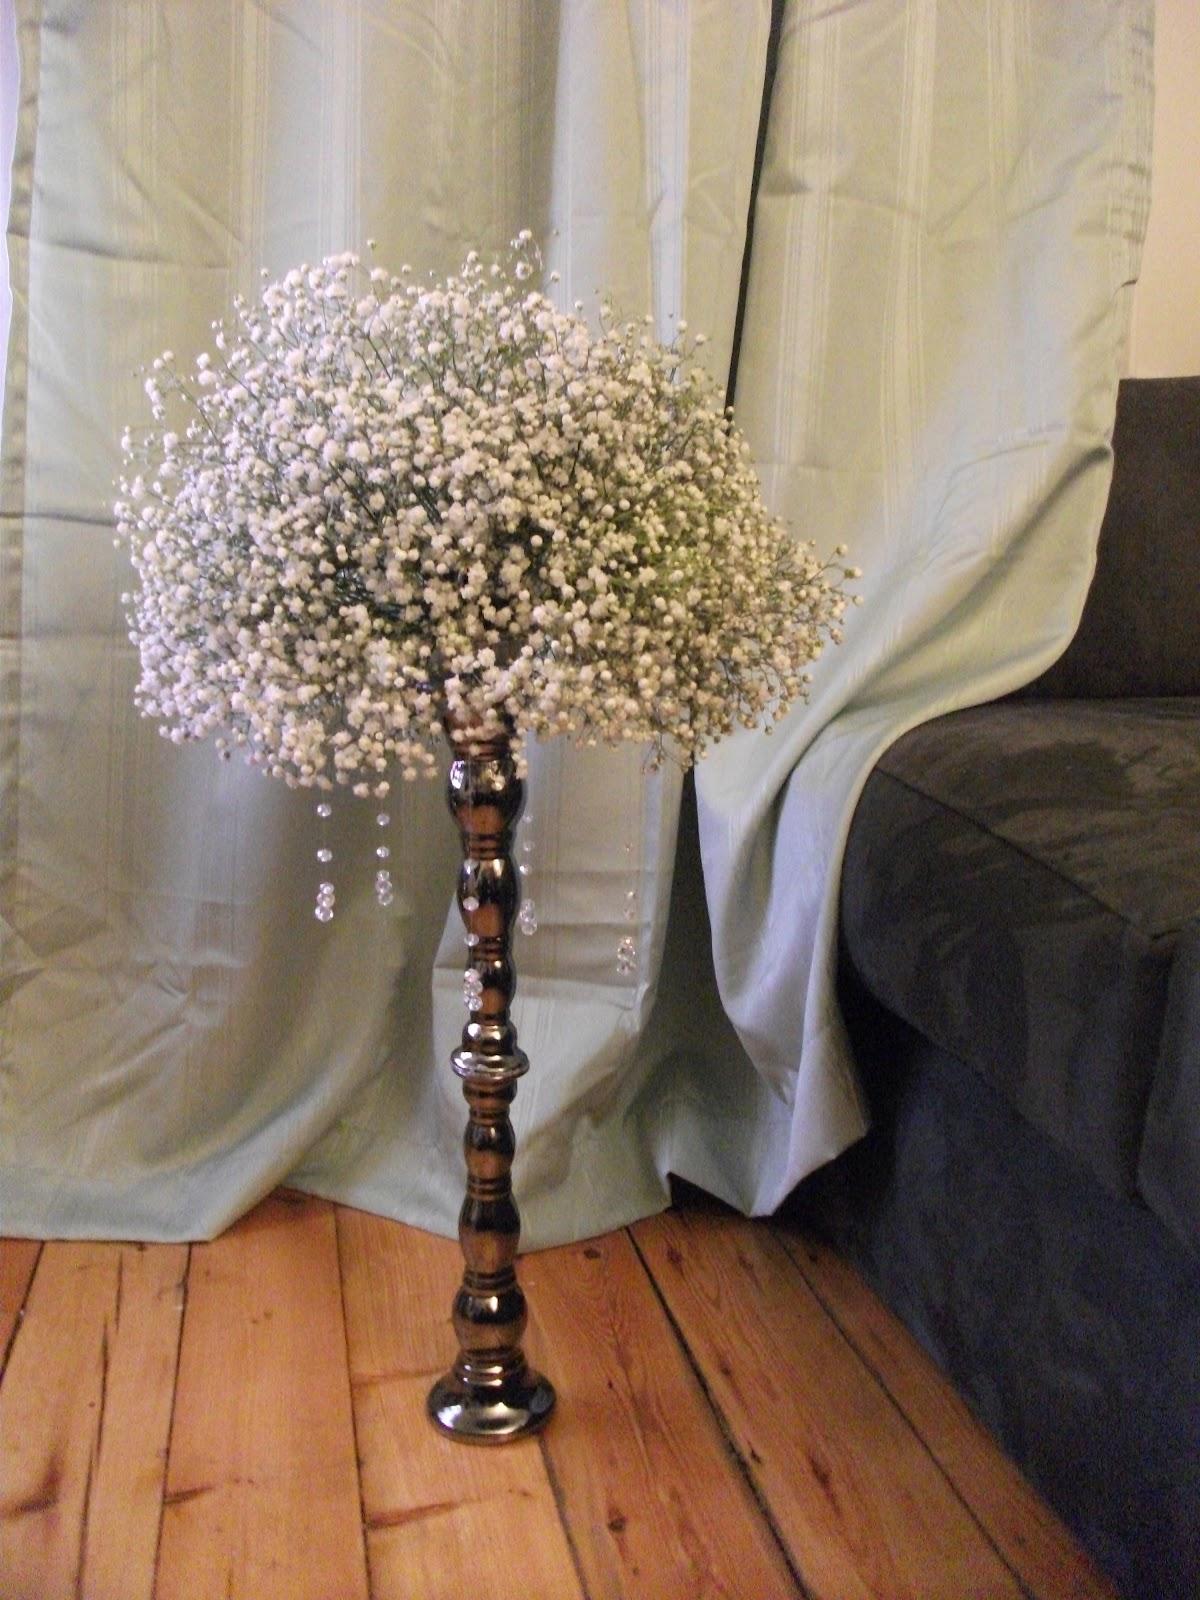 DIY Wedding Centerpieces | Harlow & Thistle - Home Design ...